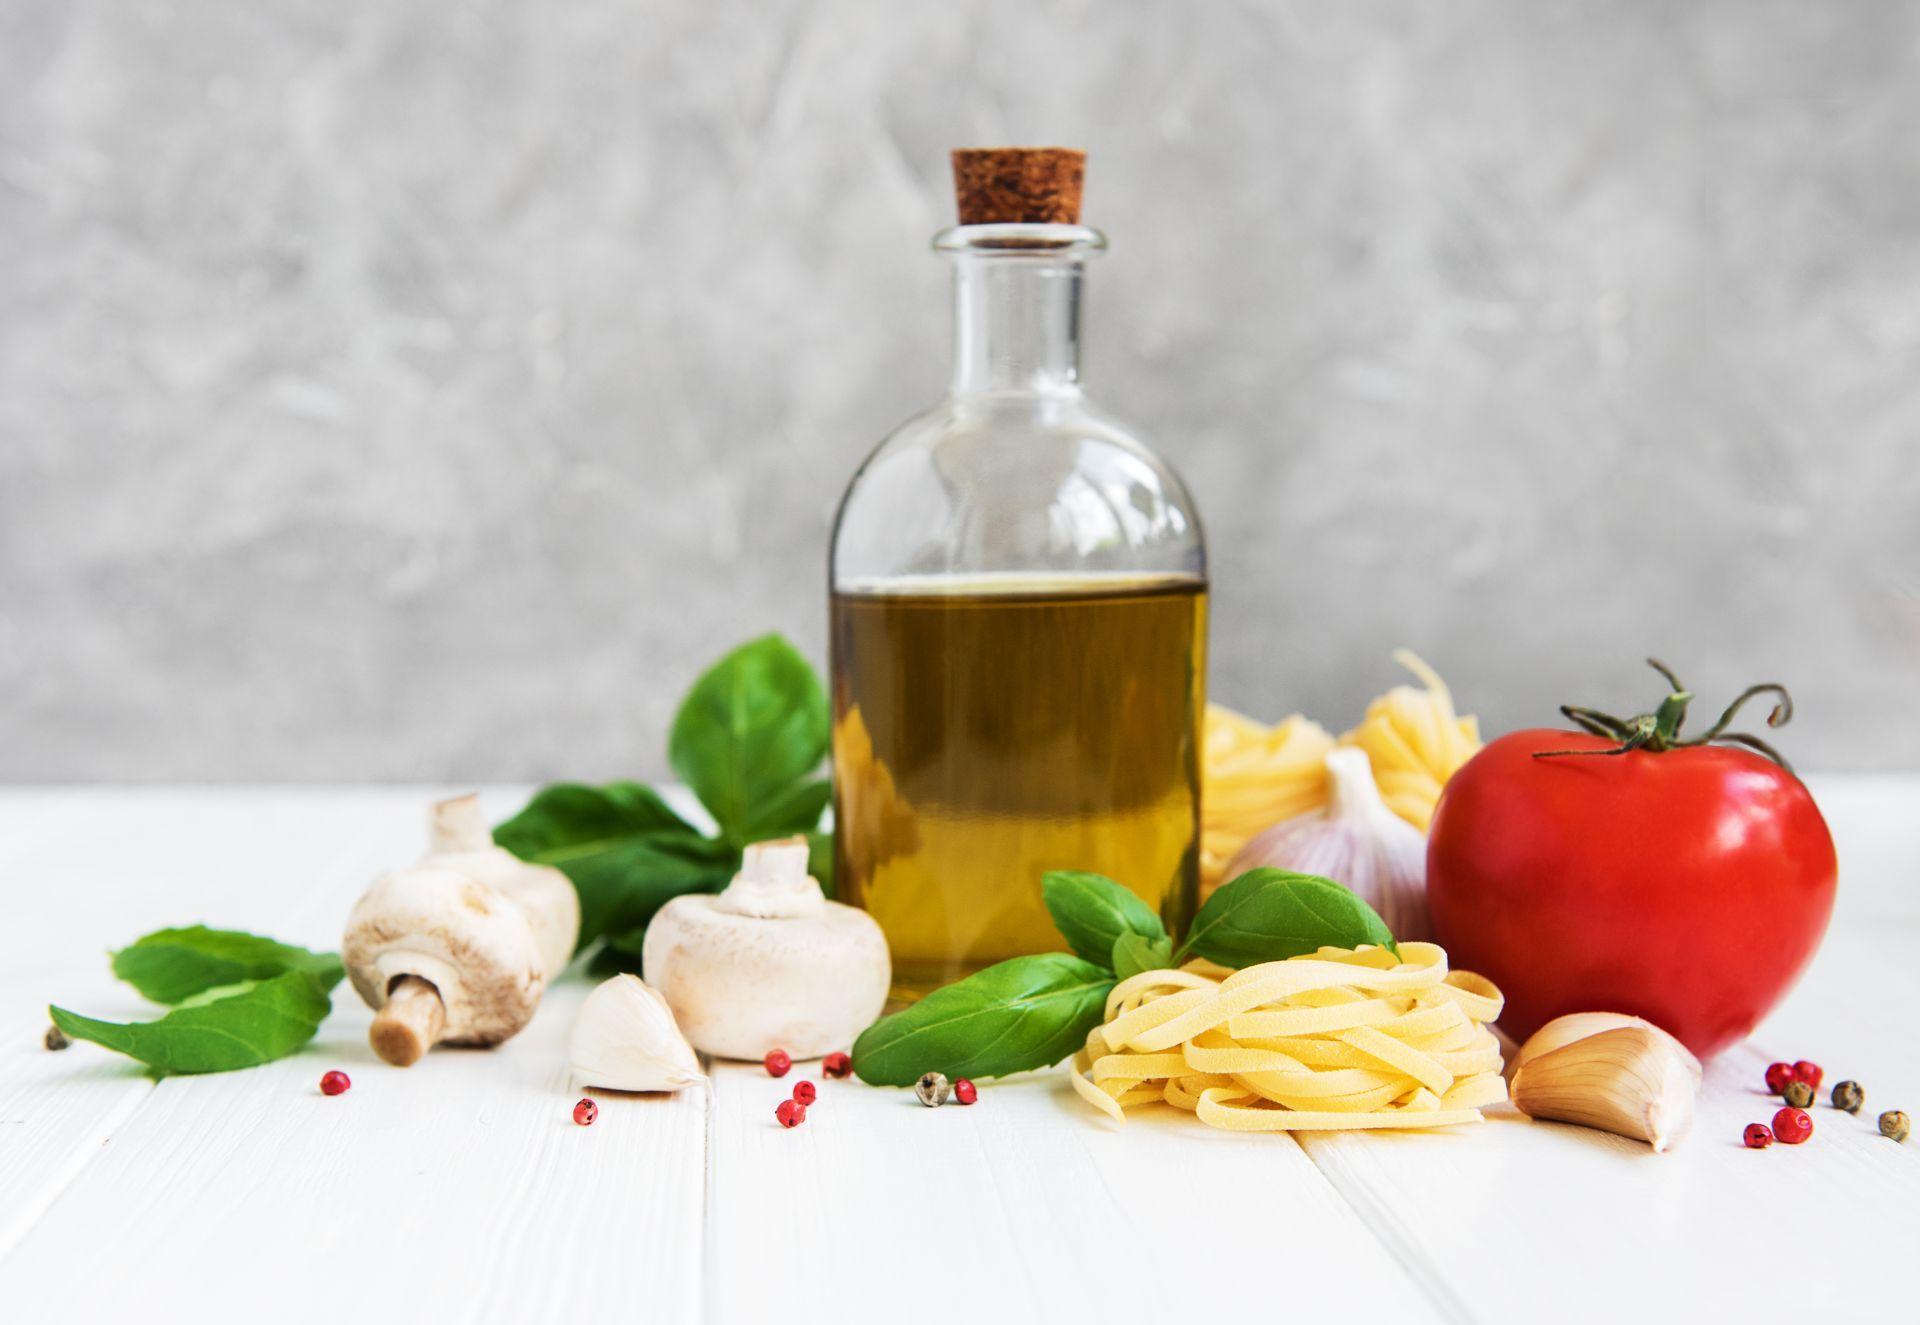 https://lirp-cdn.multiscreensite.com/b793256e/dms3rep/multi/opt/Alimentari-Buscema-Crotone-013-1920w.jpg